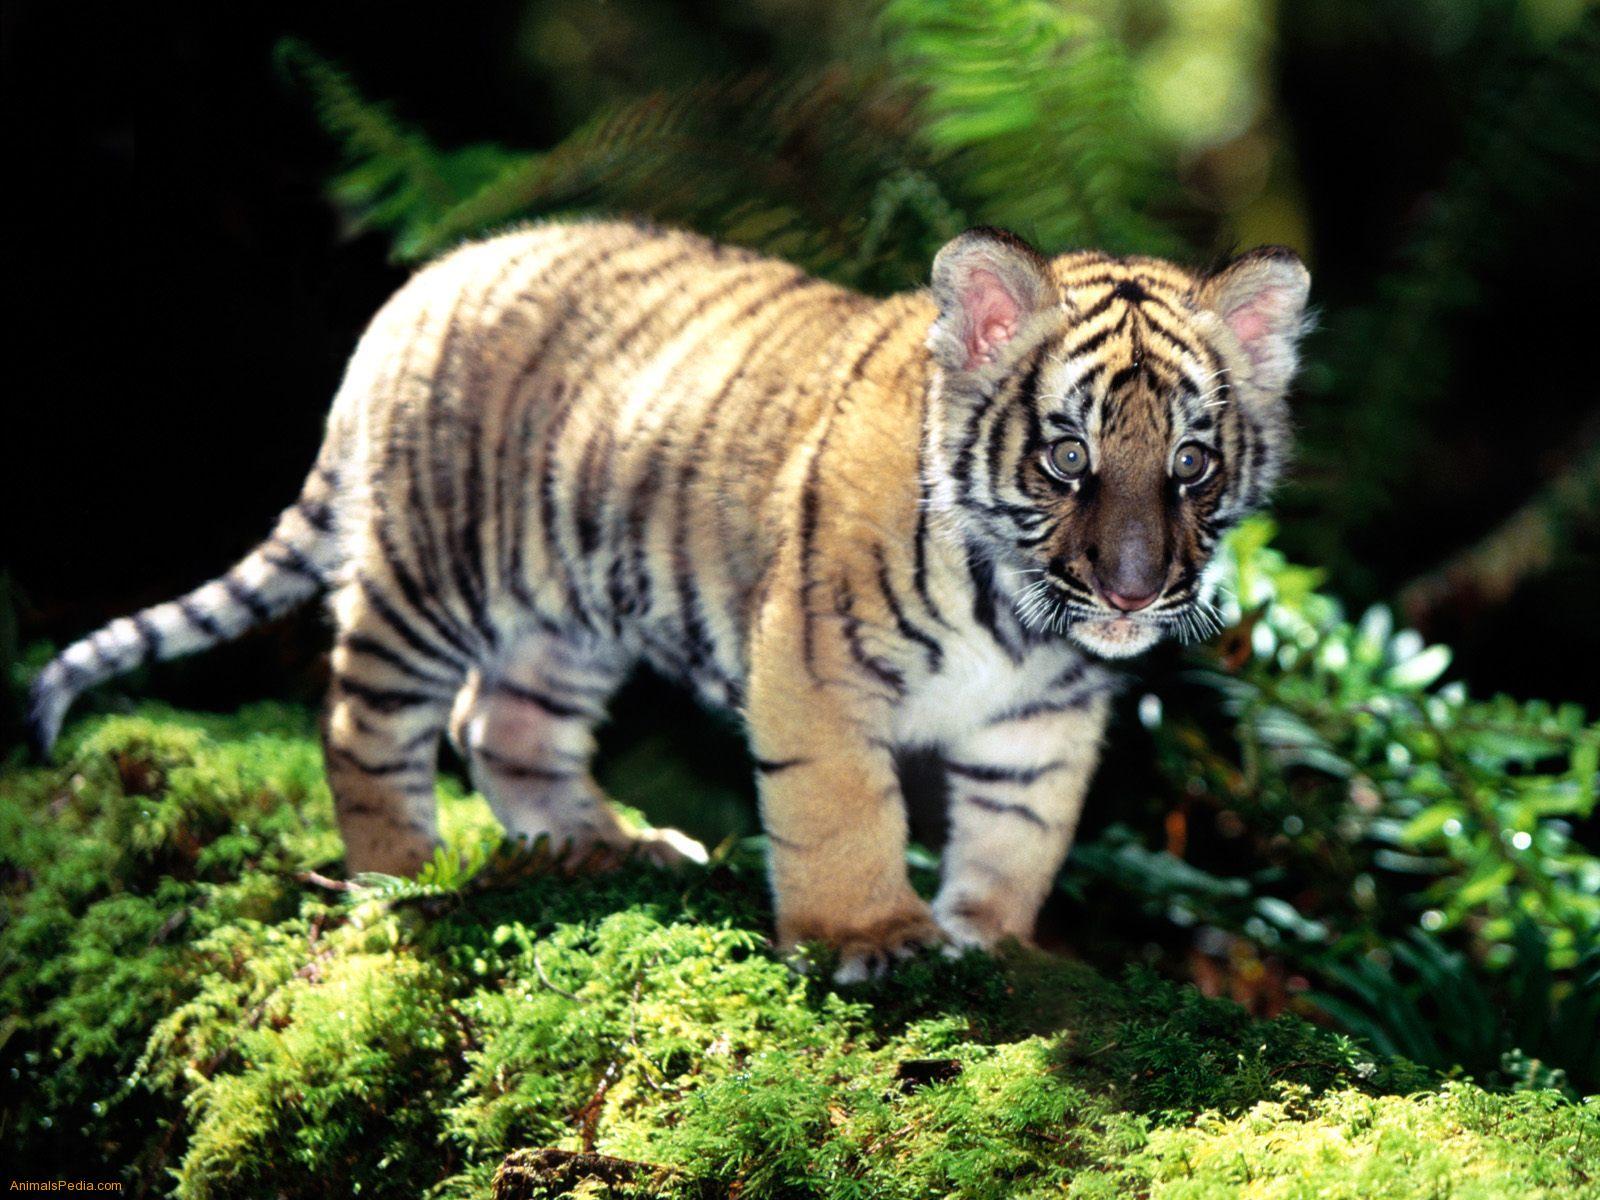 Encyclopaedia of Babies of Beautiful Wild Animals: Tiger Cubs Cute Siberian Tiger Cubs